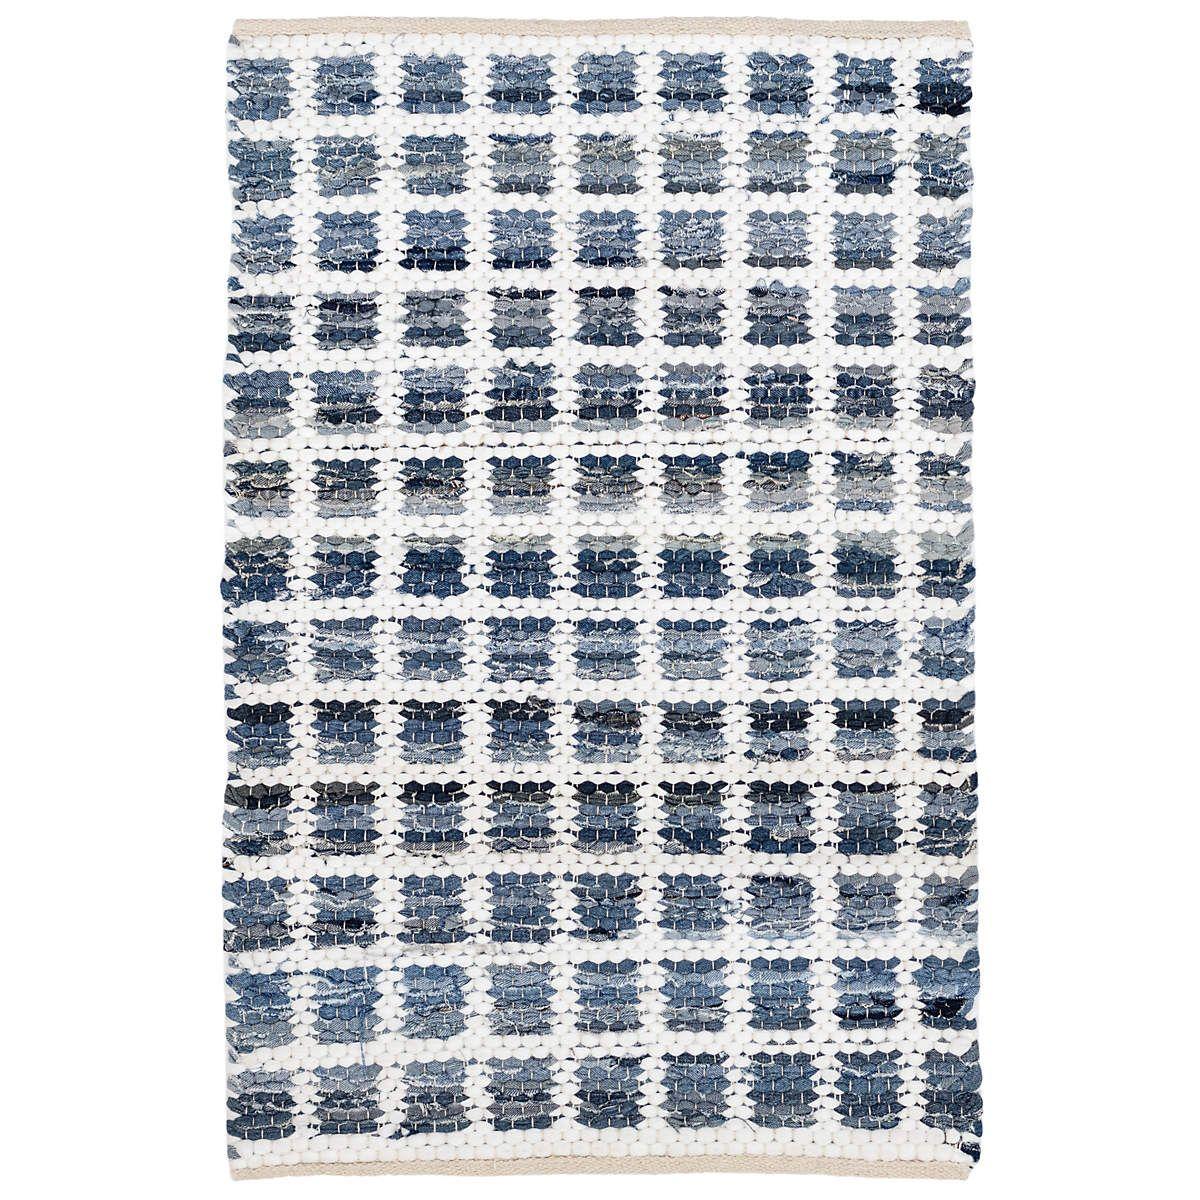 Denim Rag Squares Woven Cotton Rug Dash Albert In 2020 Cotton Rug Cotton Area Rug Cotton Rag Rug